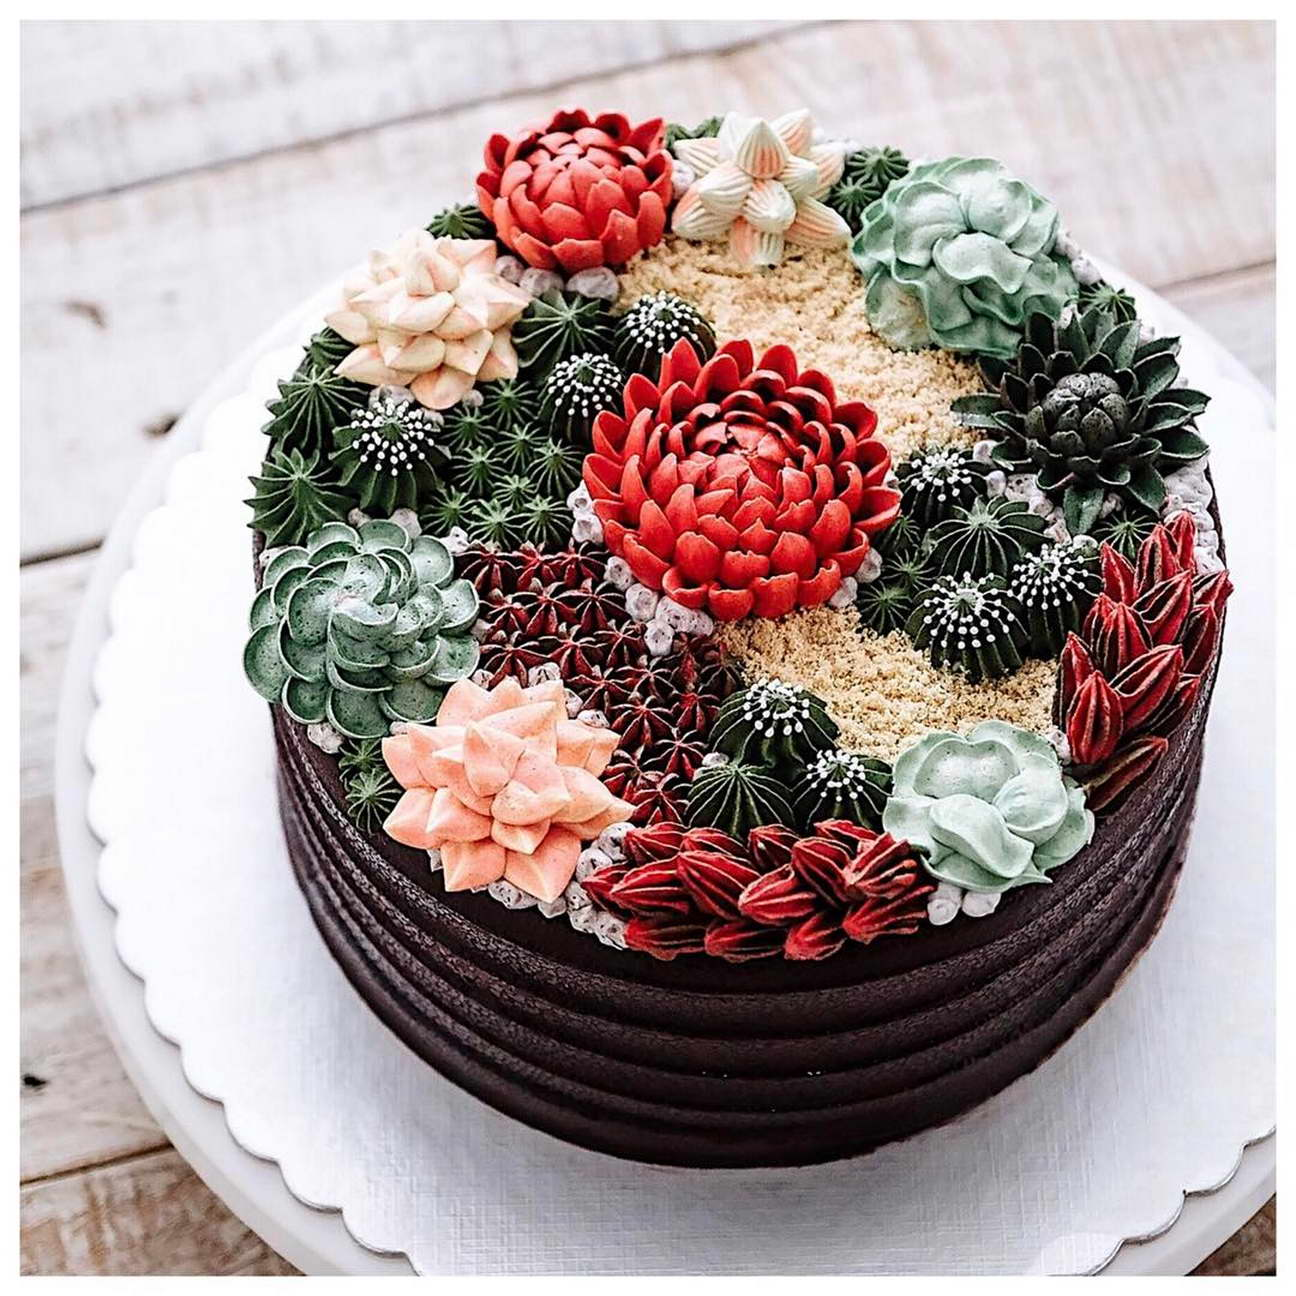 kézműves virág torta, kreatív - kaktusz